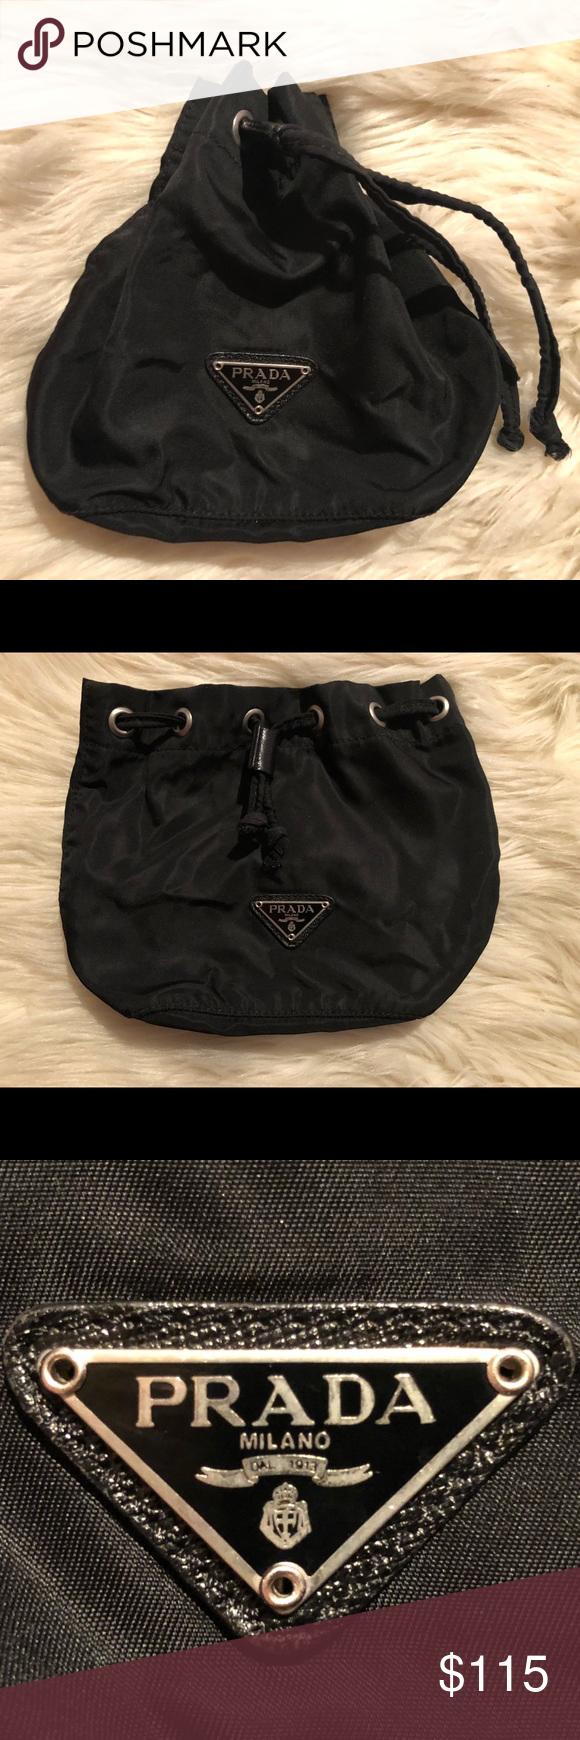 f01561df419344 Prada Vela drawstring pouch Authentic. Made from black Vela fabric with  silver triangular logo plate